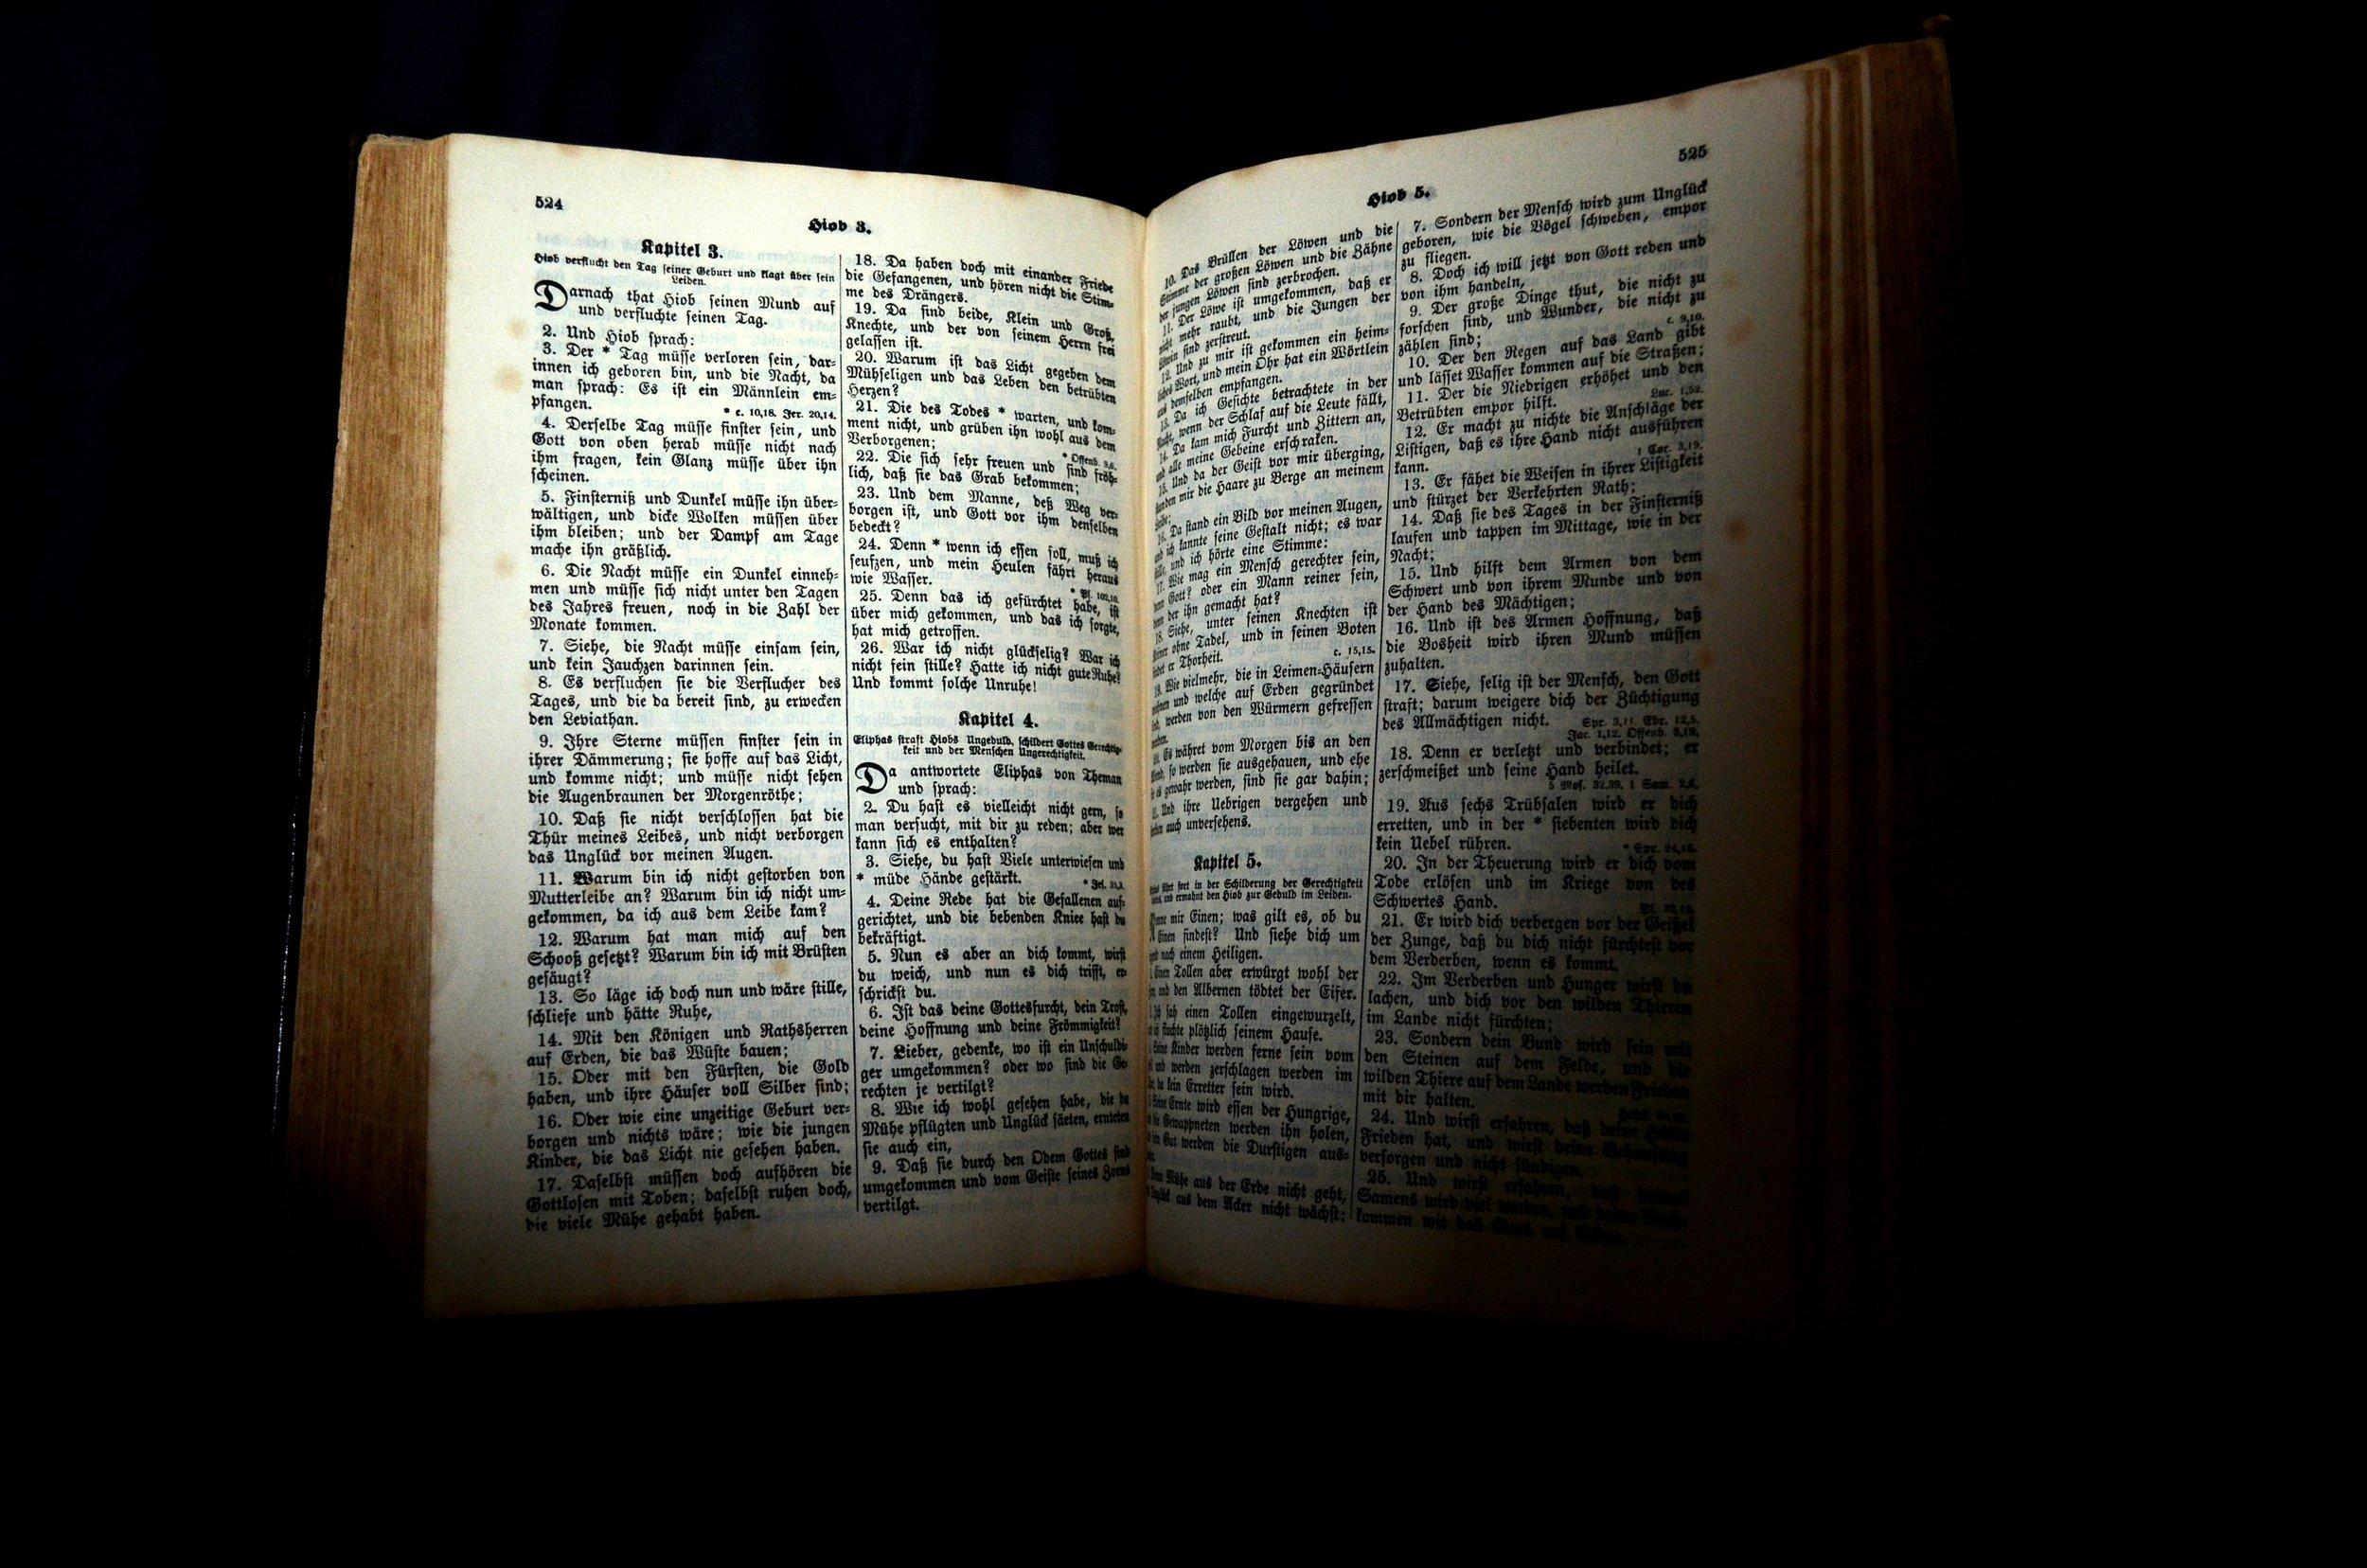 bible-black-background-book-208278.jpg